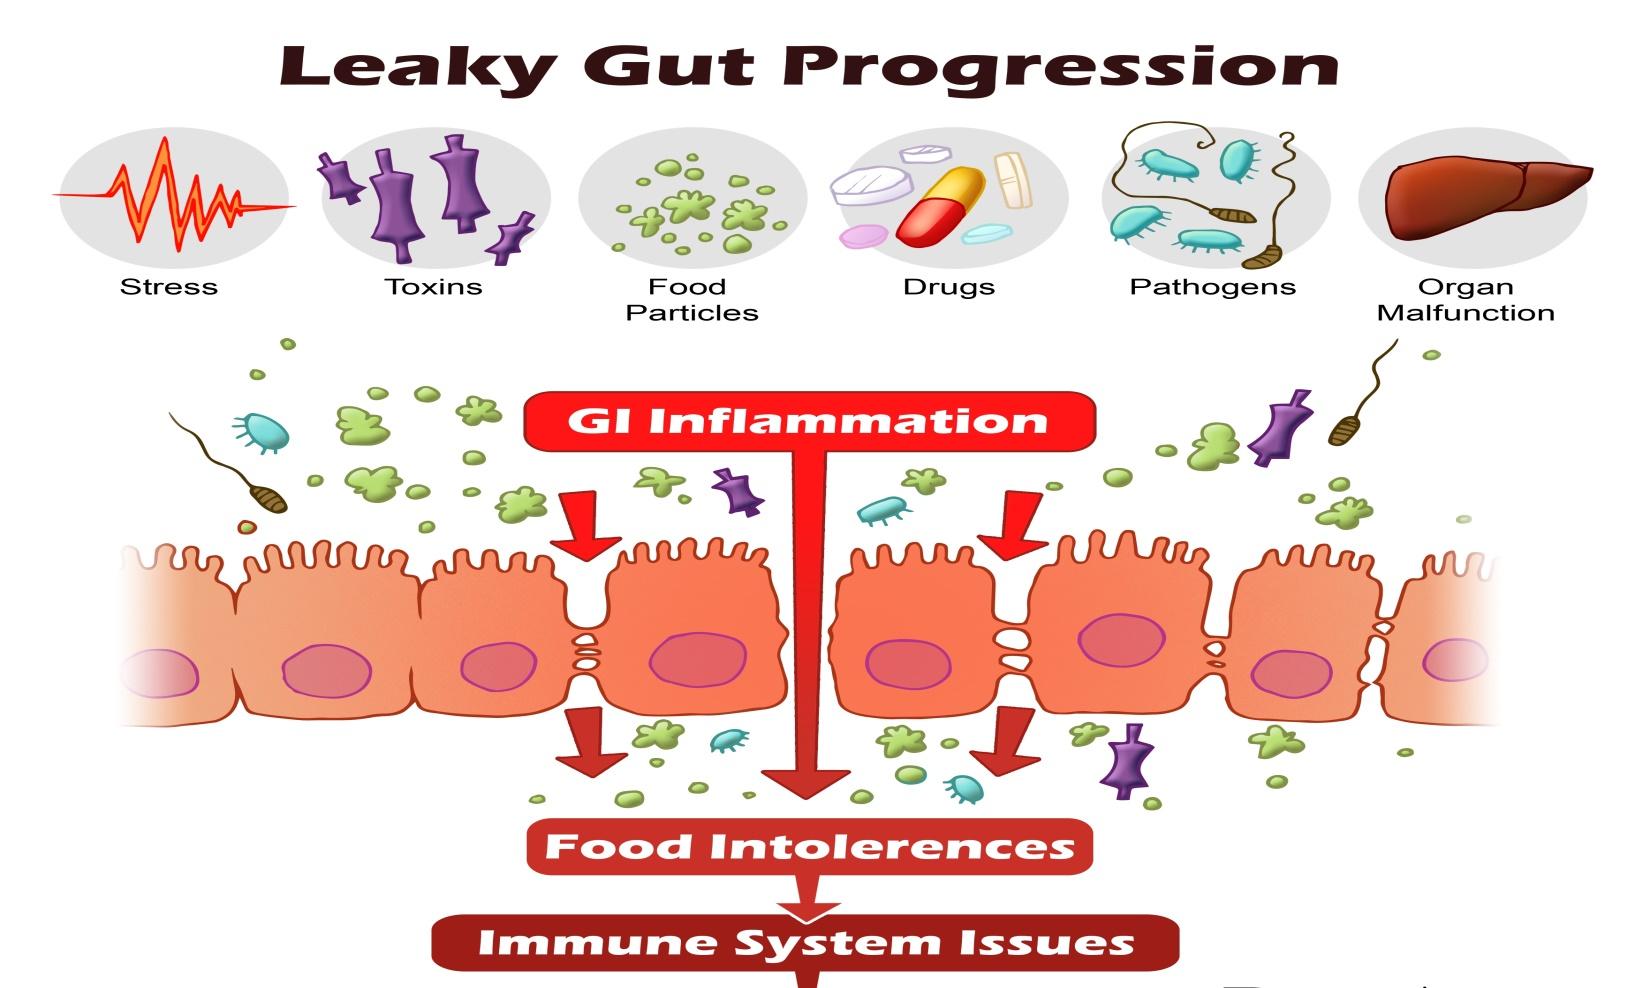 Dysbiosis leaky gut. Inflammation, dysbiosis and chronic disease kill papillomavirus